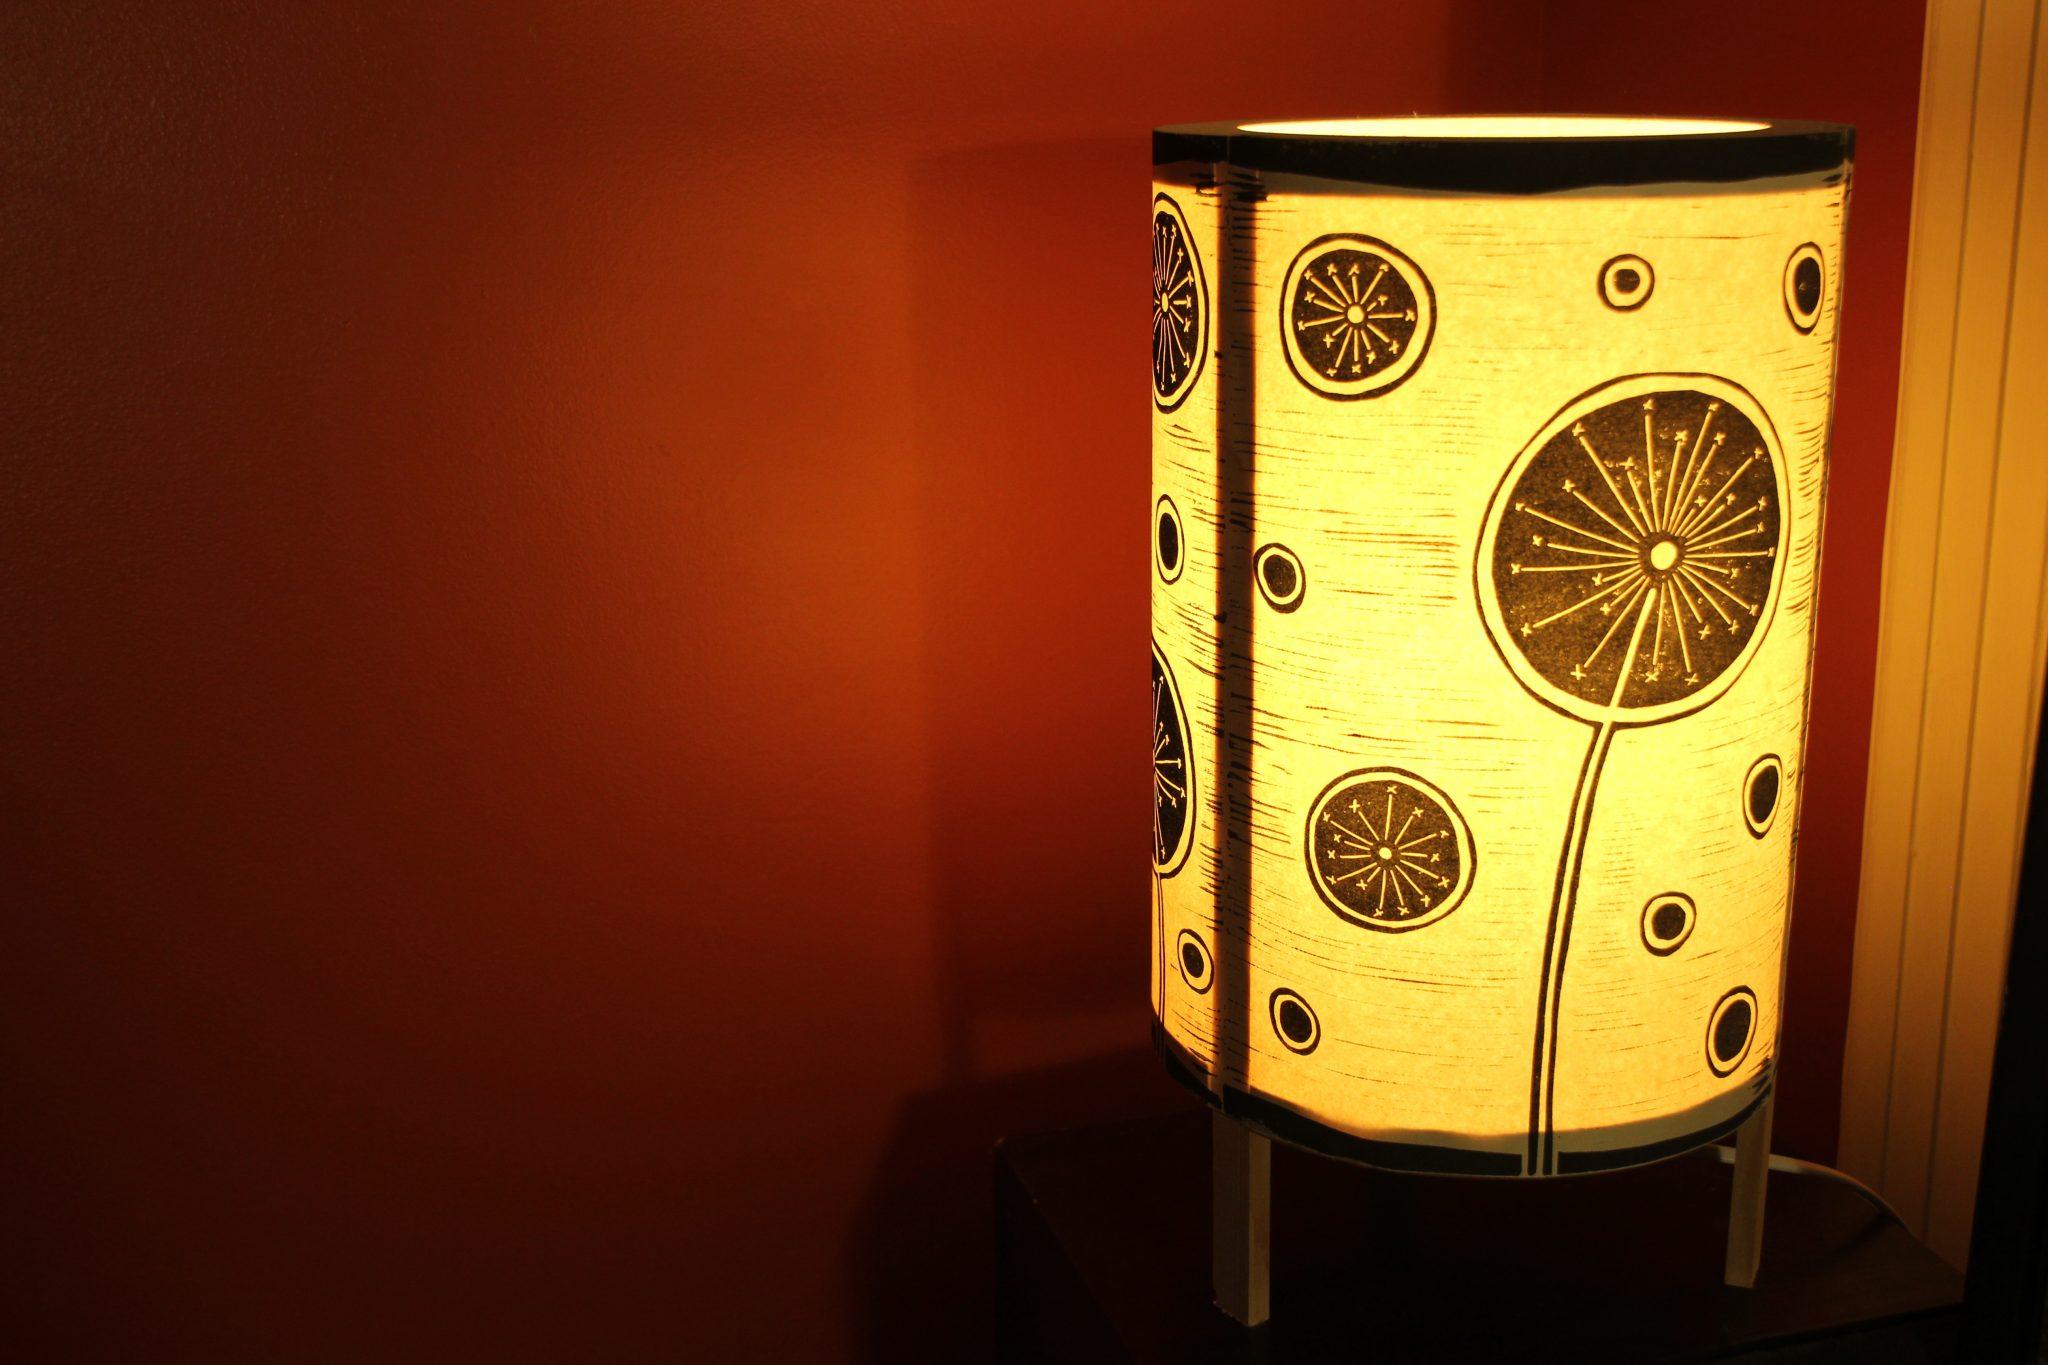 lampe artisanale | LinoLino | Linogravure | Créations artisanales